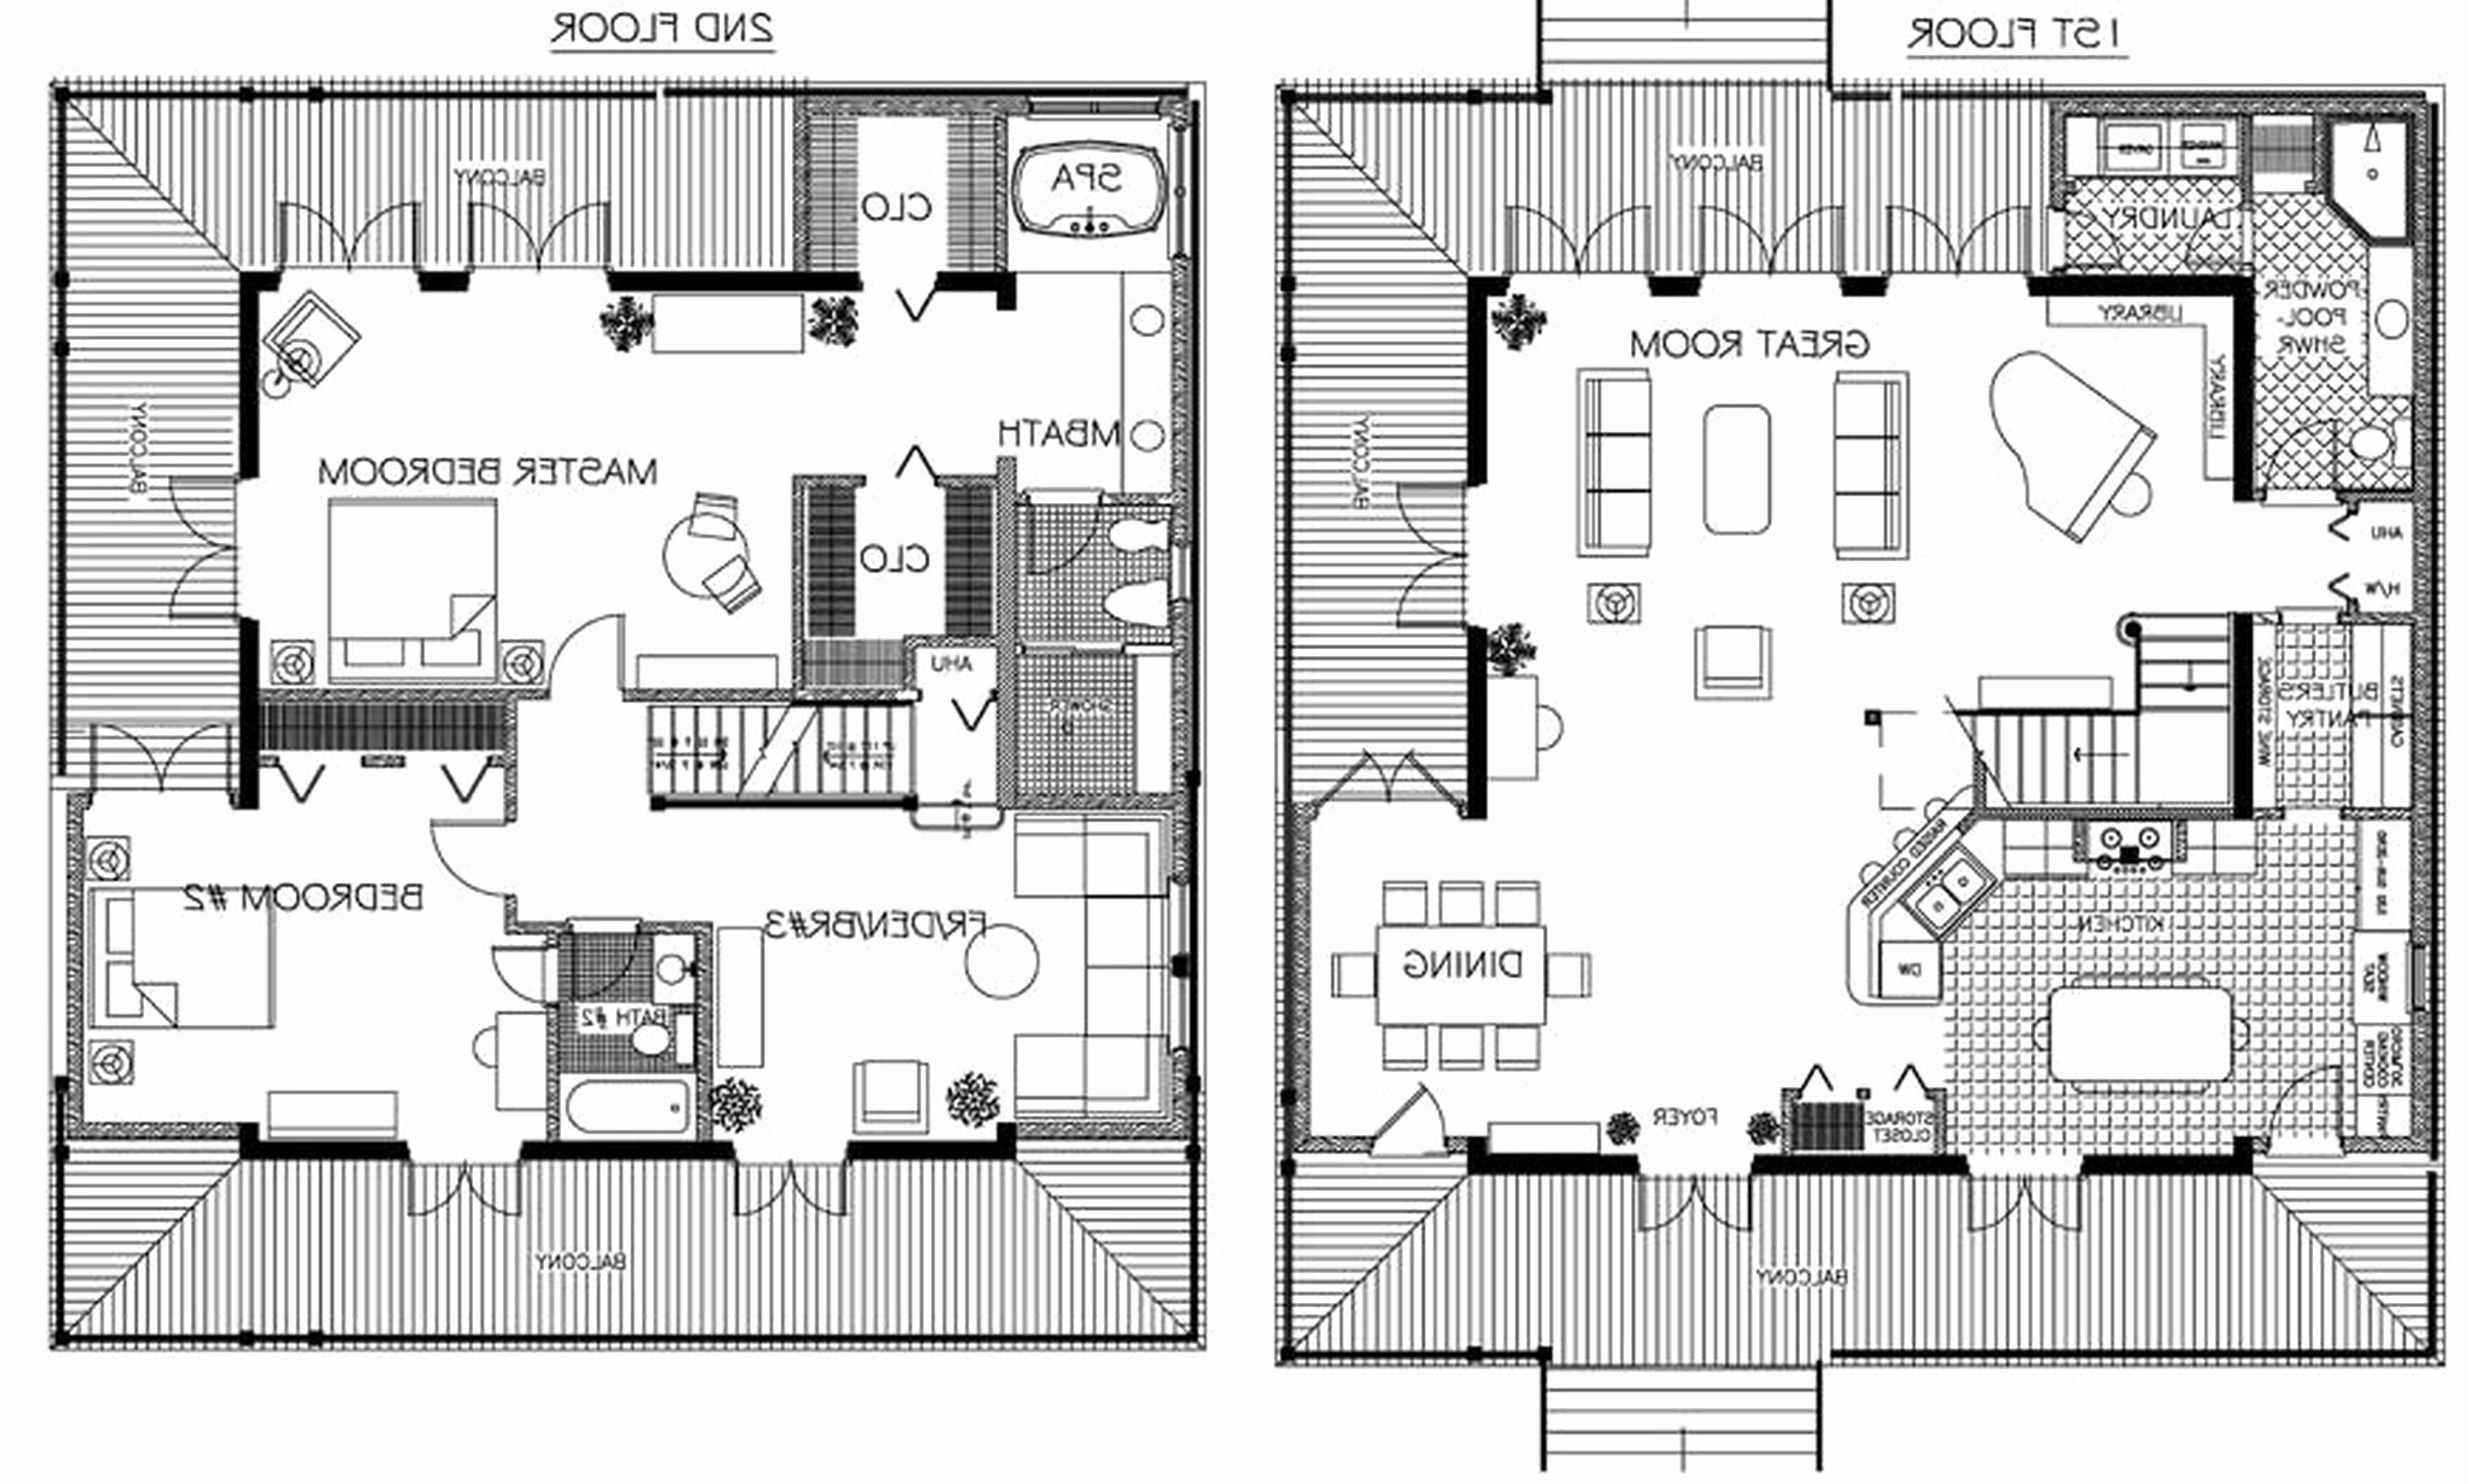 Sip House Plans Inspirational Www Kerala Home Plans Elegant Home Plans Kerala Model Luxur Japan House Design Minecraft Modern House Blueprints House Blueprints